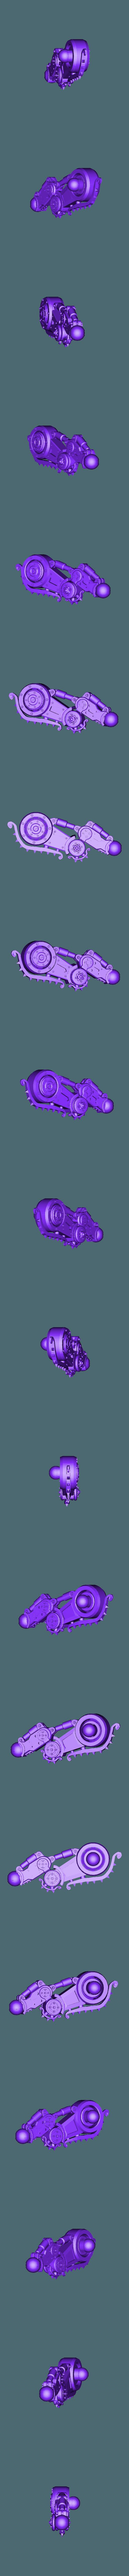 Penny 2.0 Leg 2B.stl Download STL file Penny Nun Bot 2.0 • 3D print model, Leesedrenfort